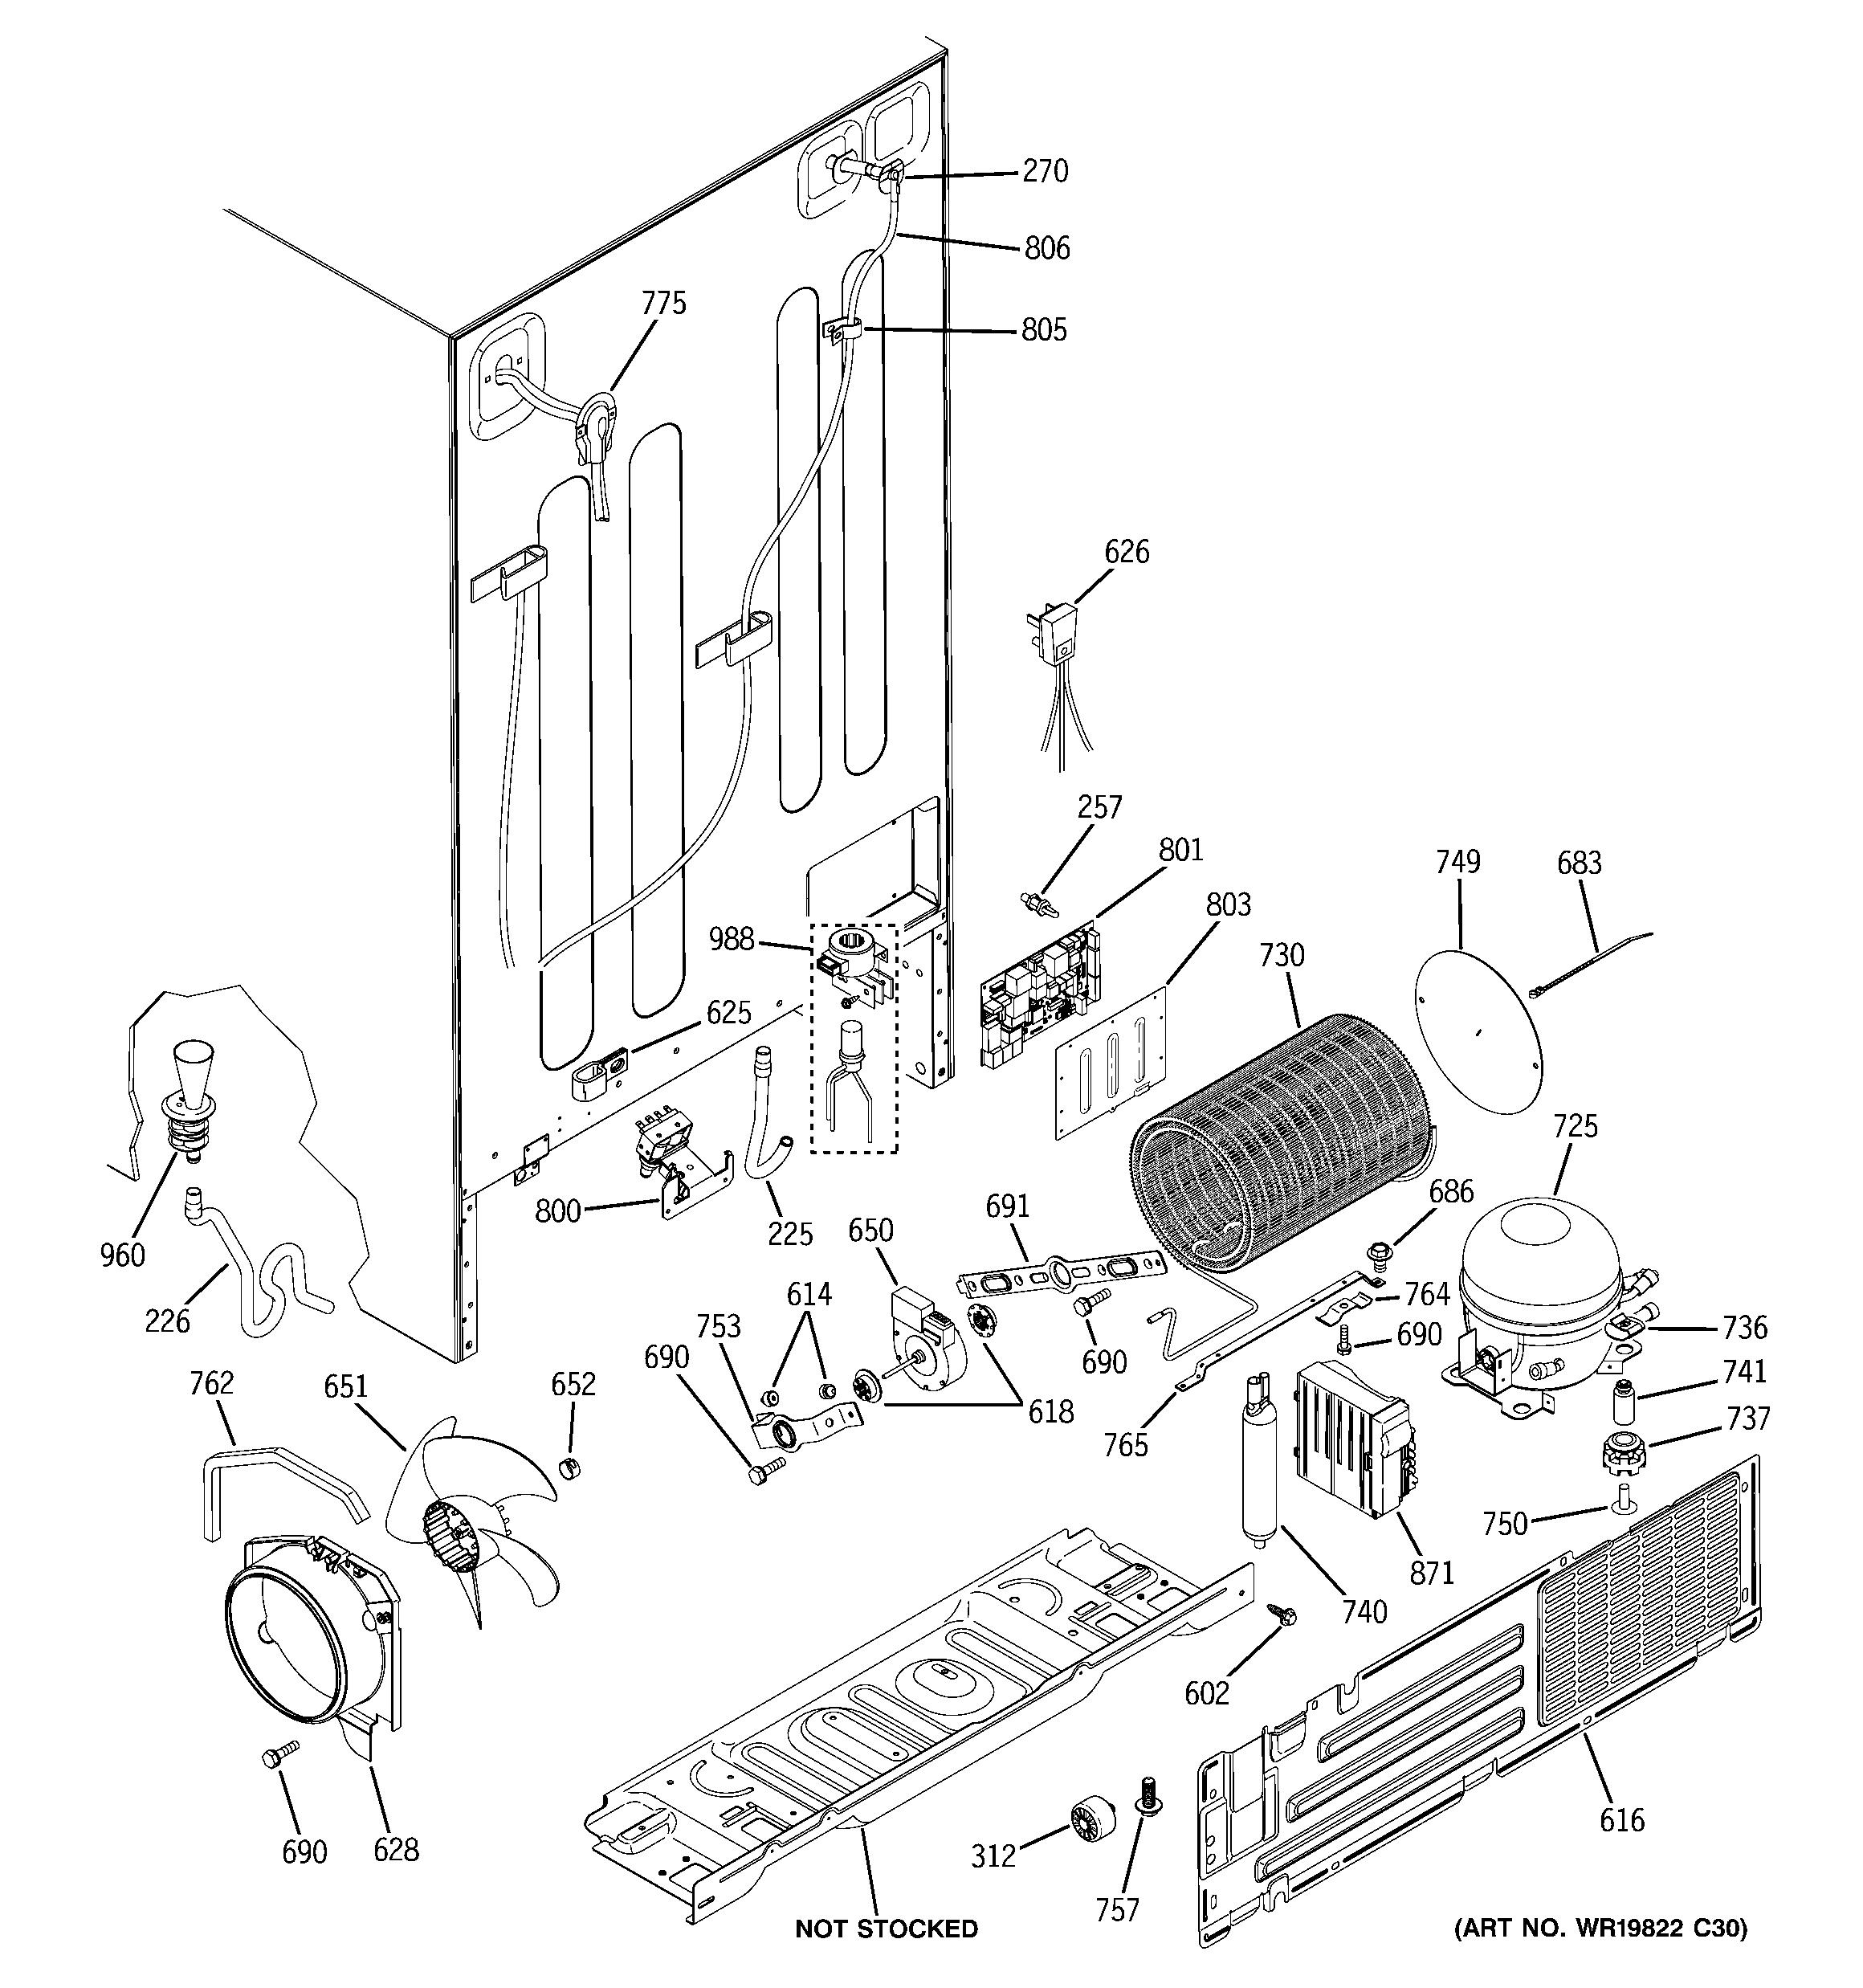 [WRG-8370] Ge Profile Refrigerator Wiring Diagram